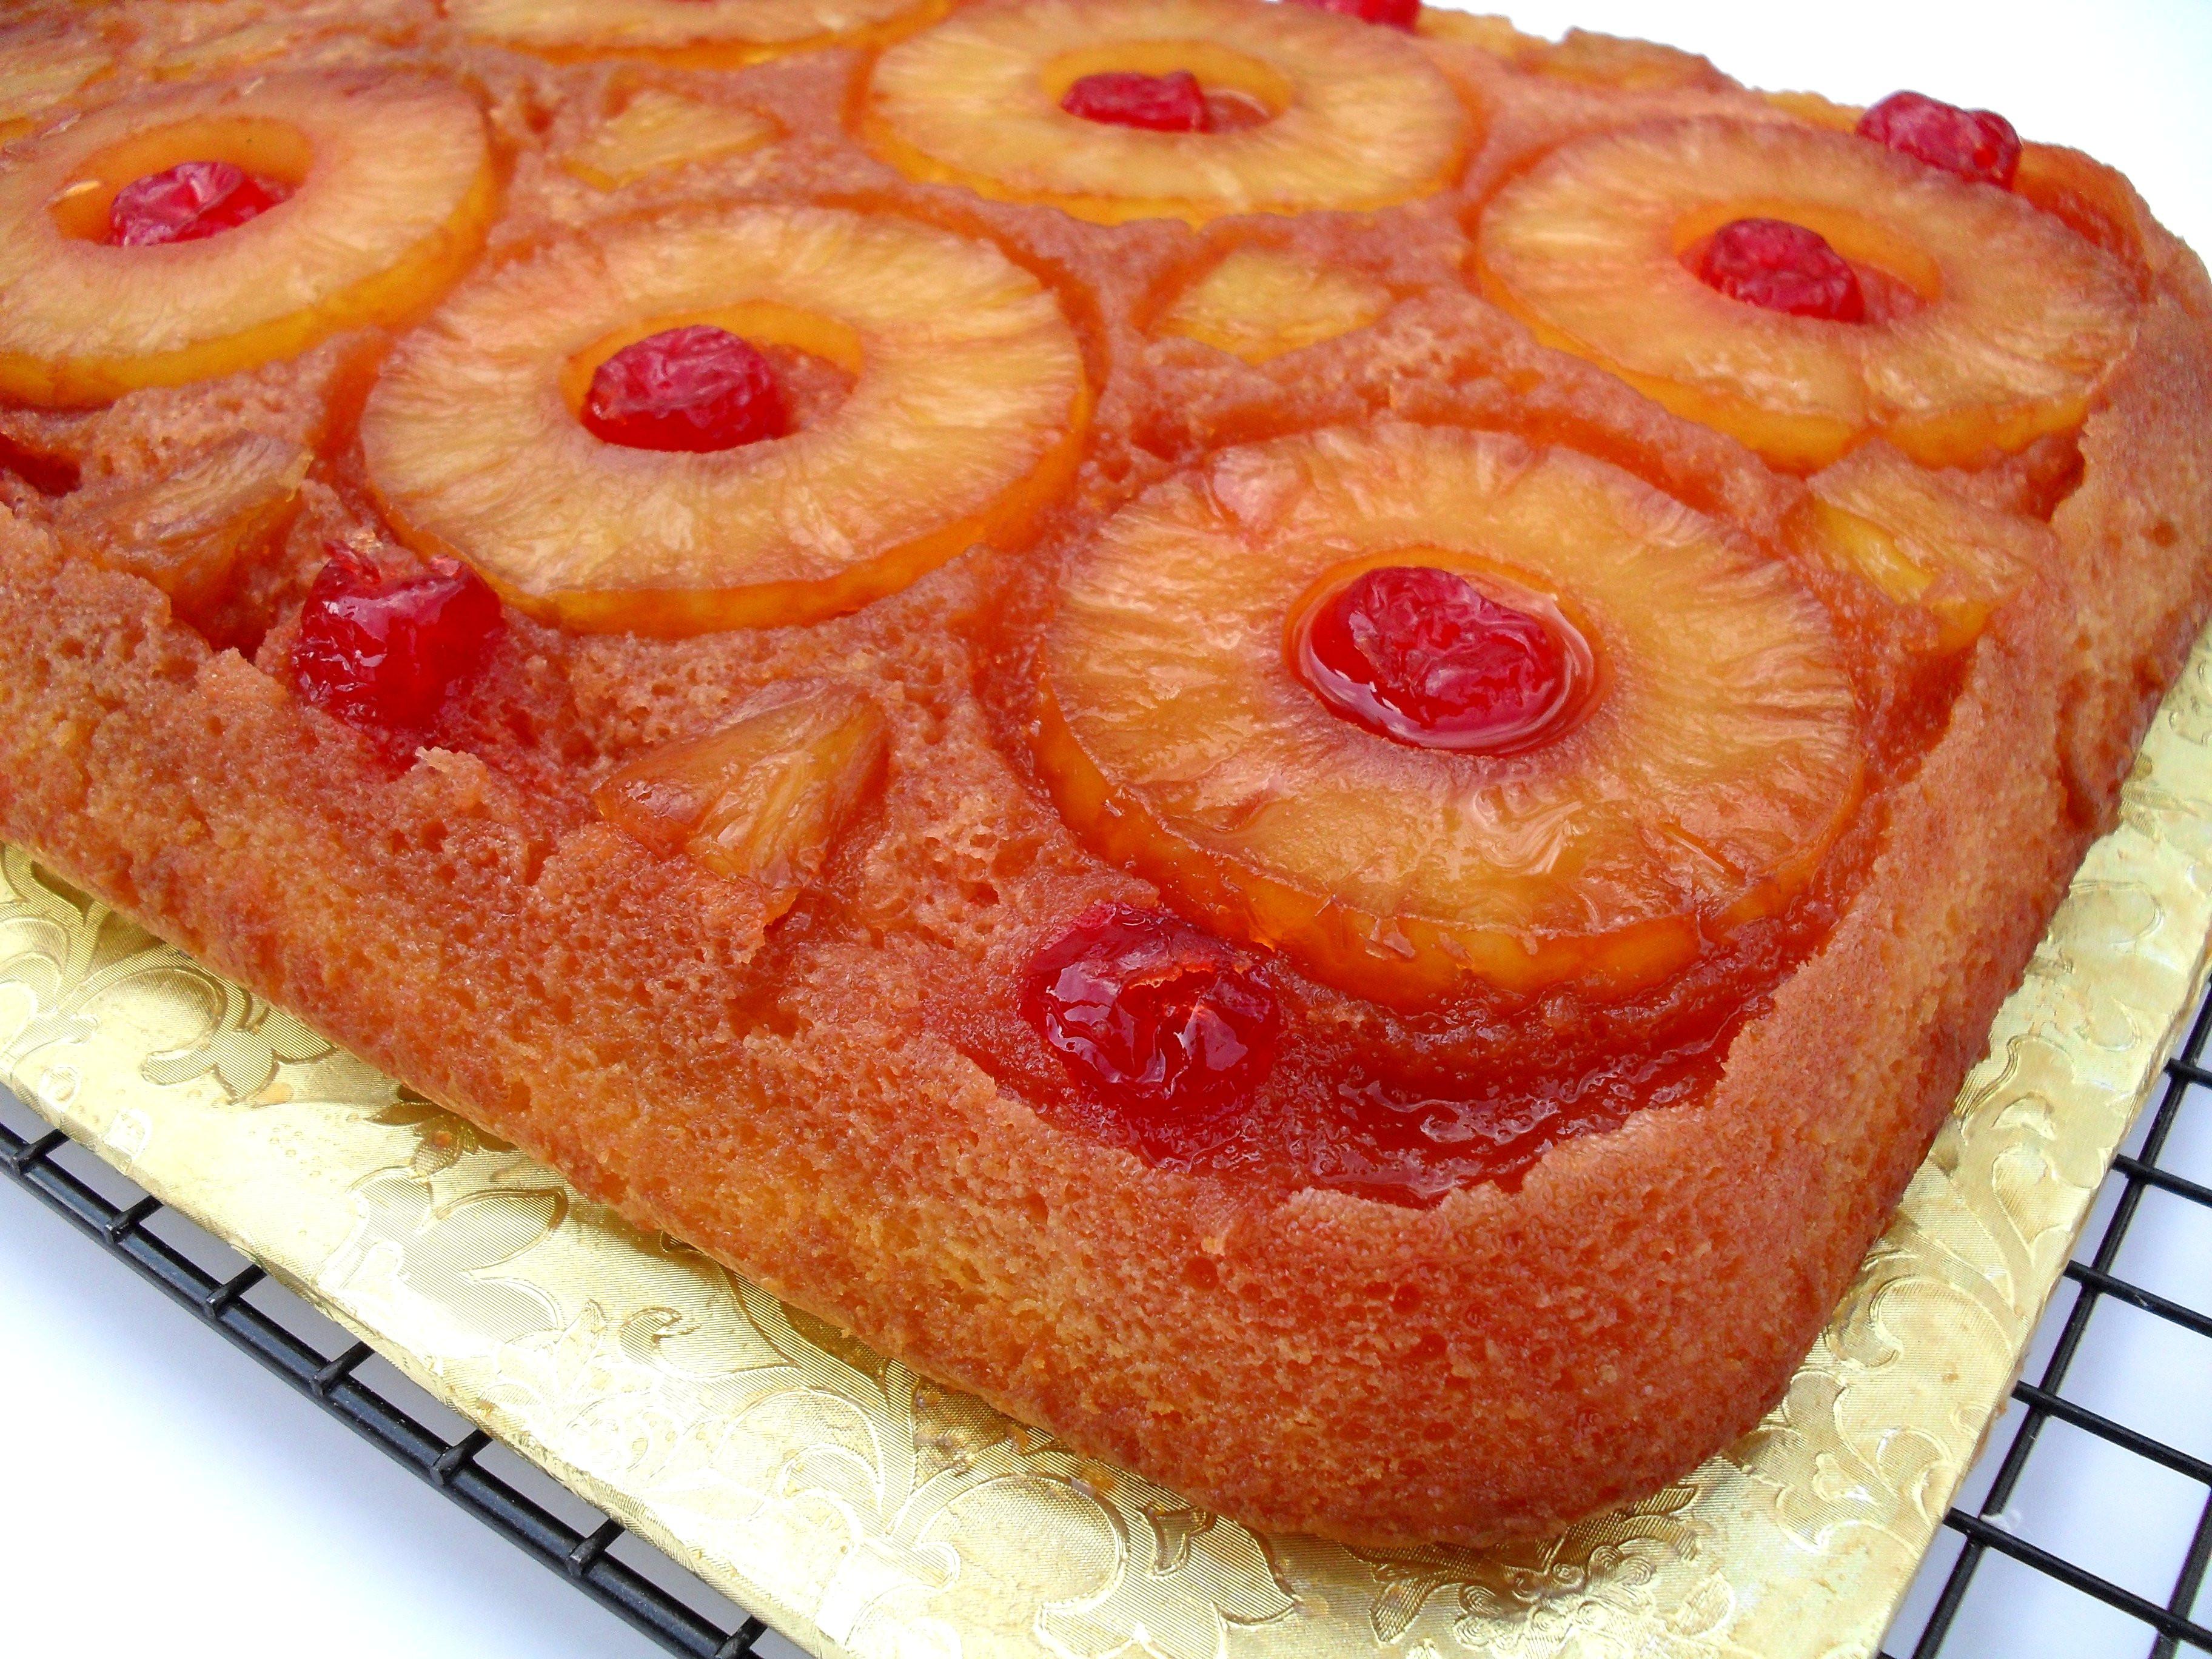 Pineapple Upside Down Cake Recipe  Upside Down Pineapple Cake Recipe 2015 House